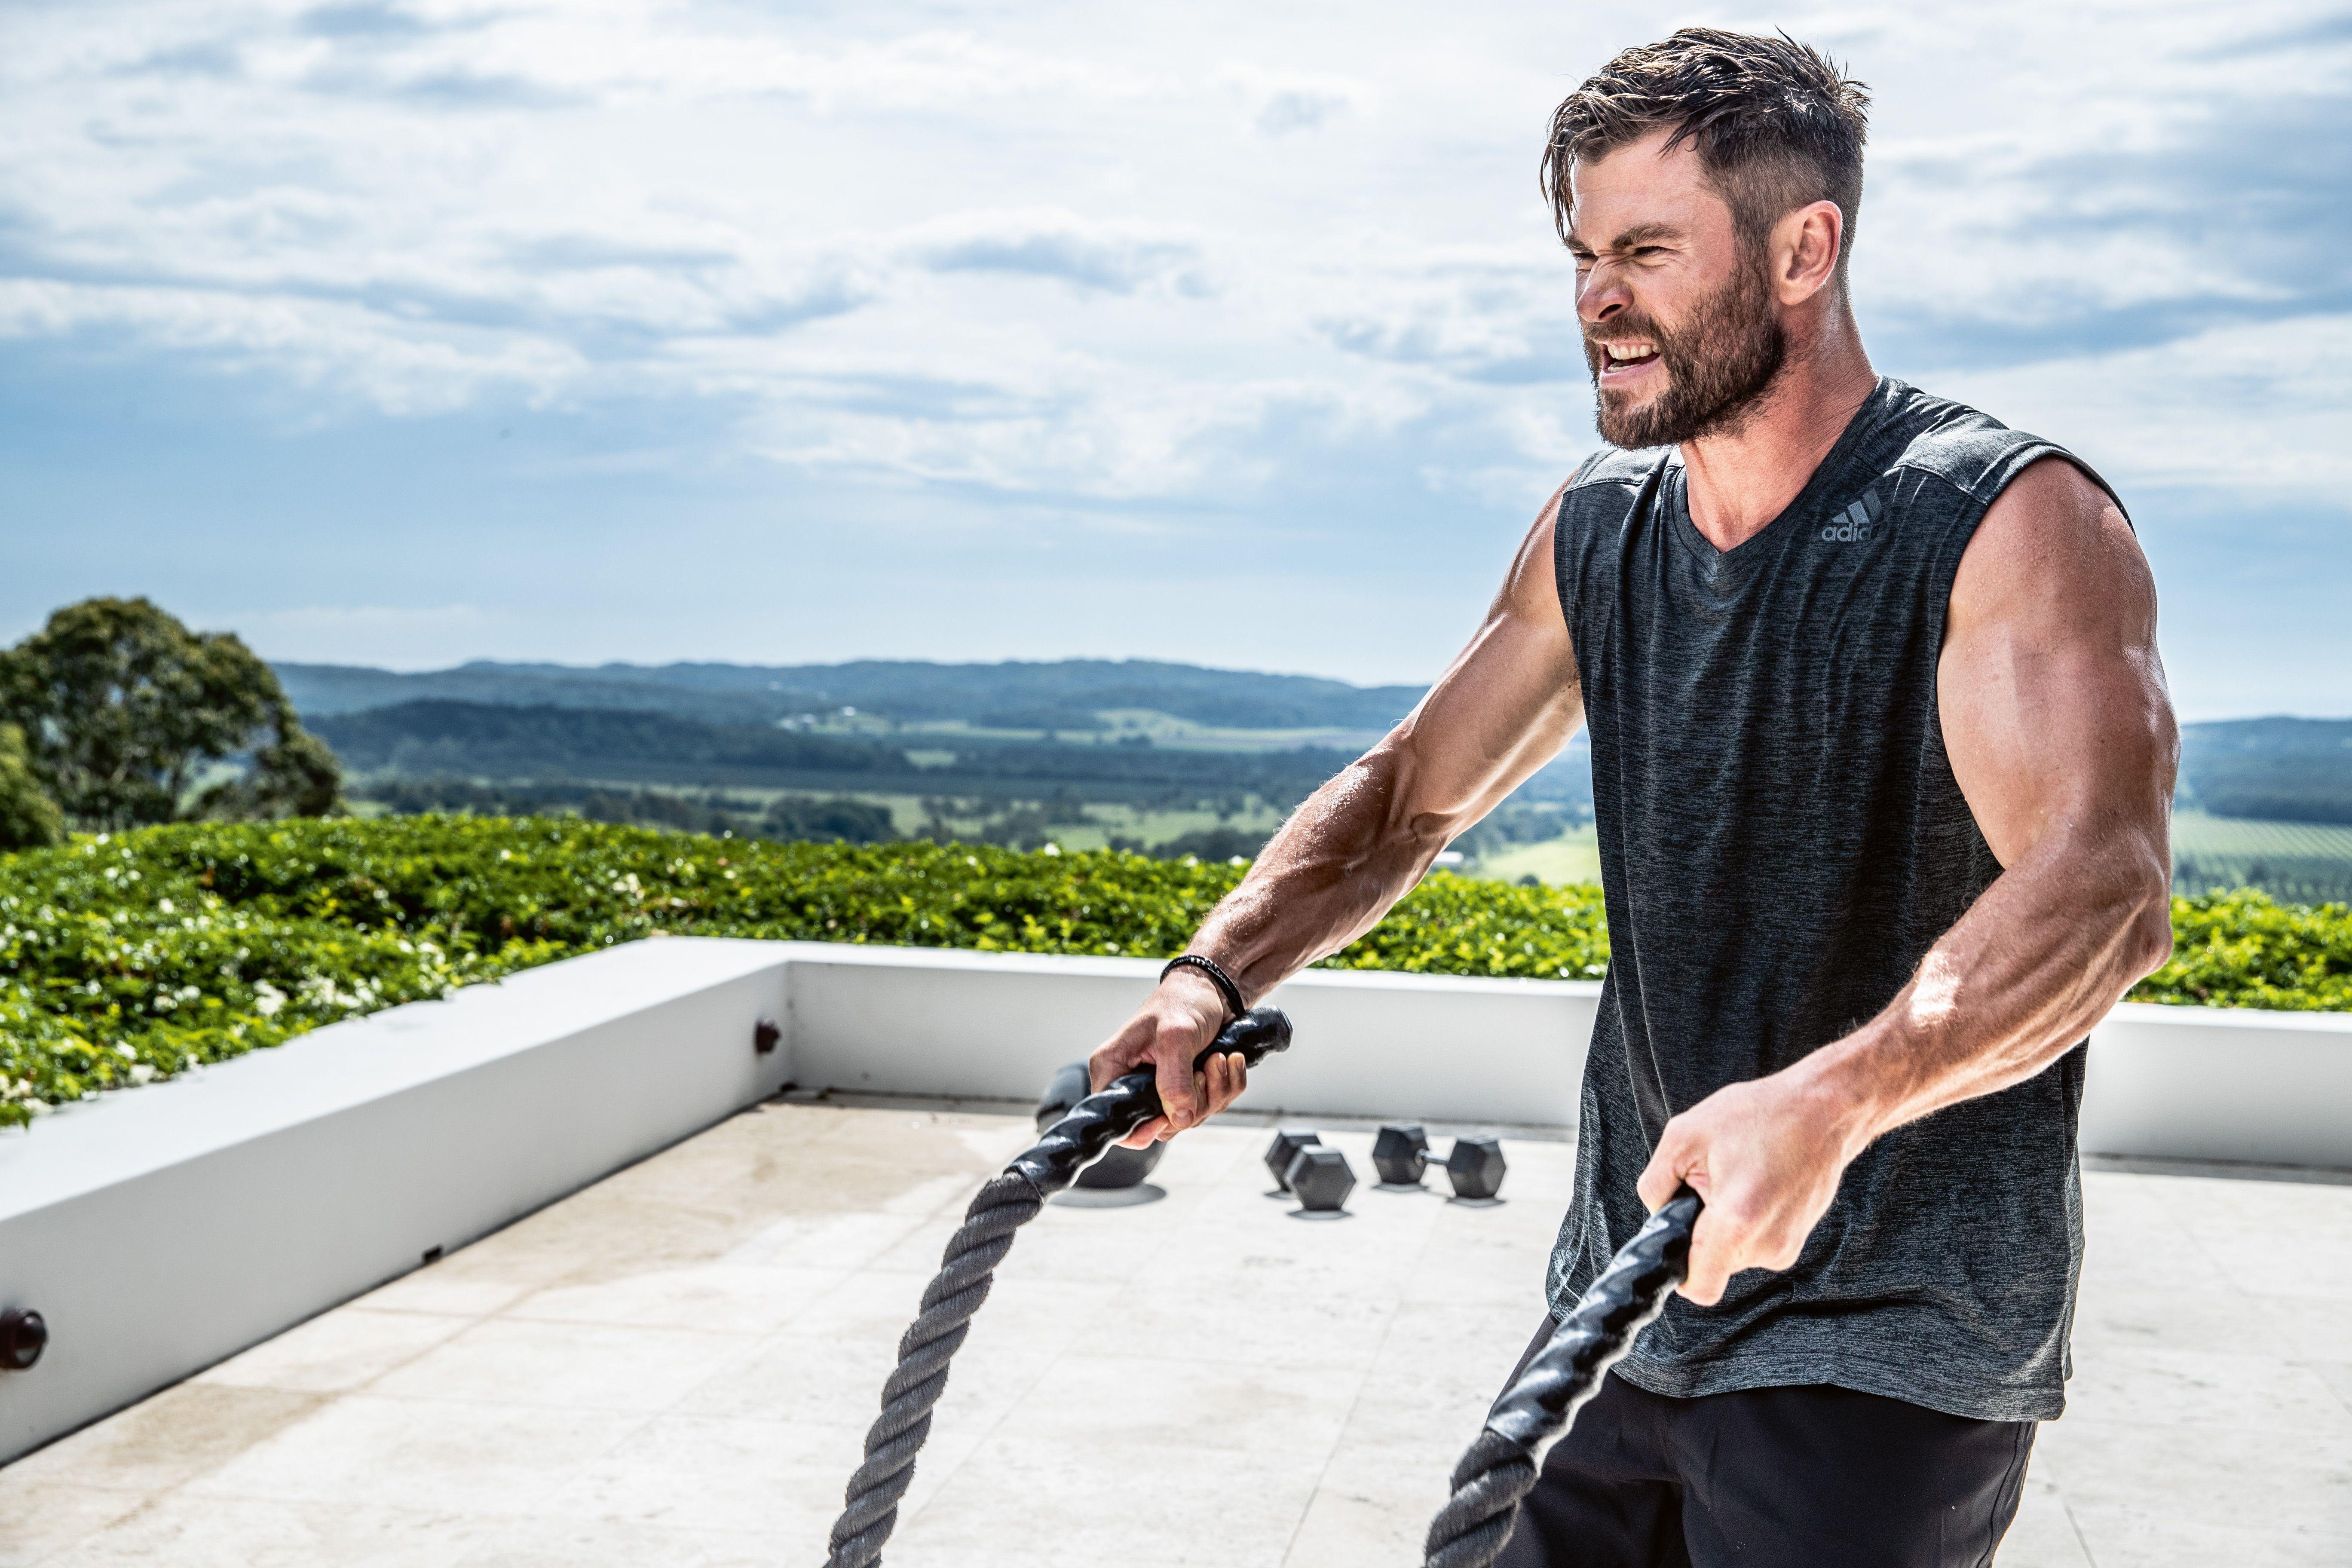 Крис хемсворт: тренировки и питание тора - школа тела